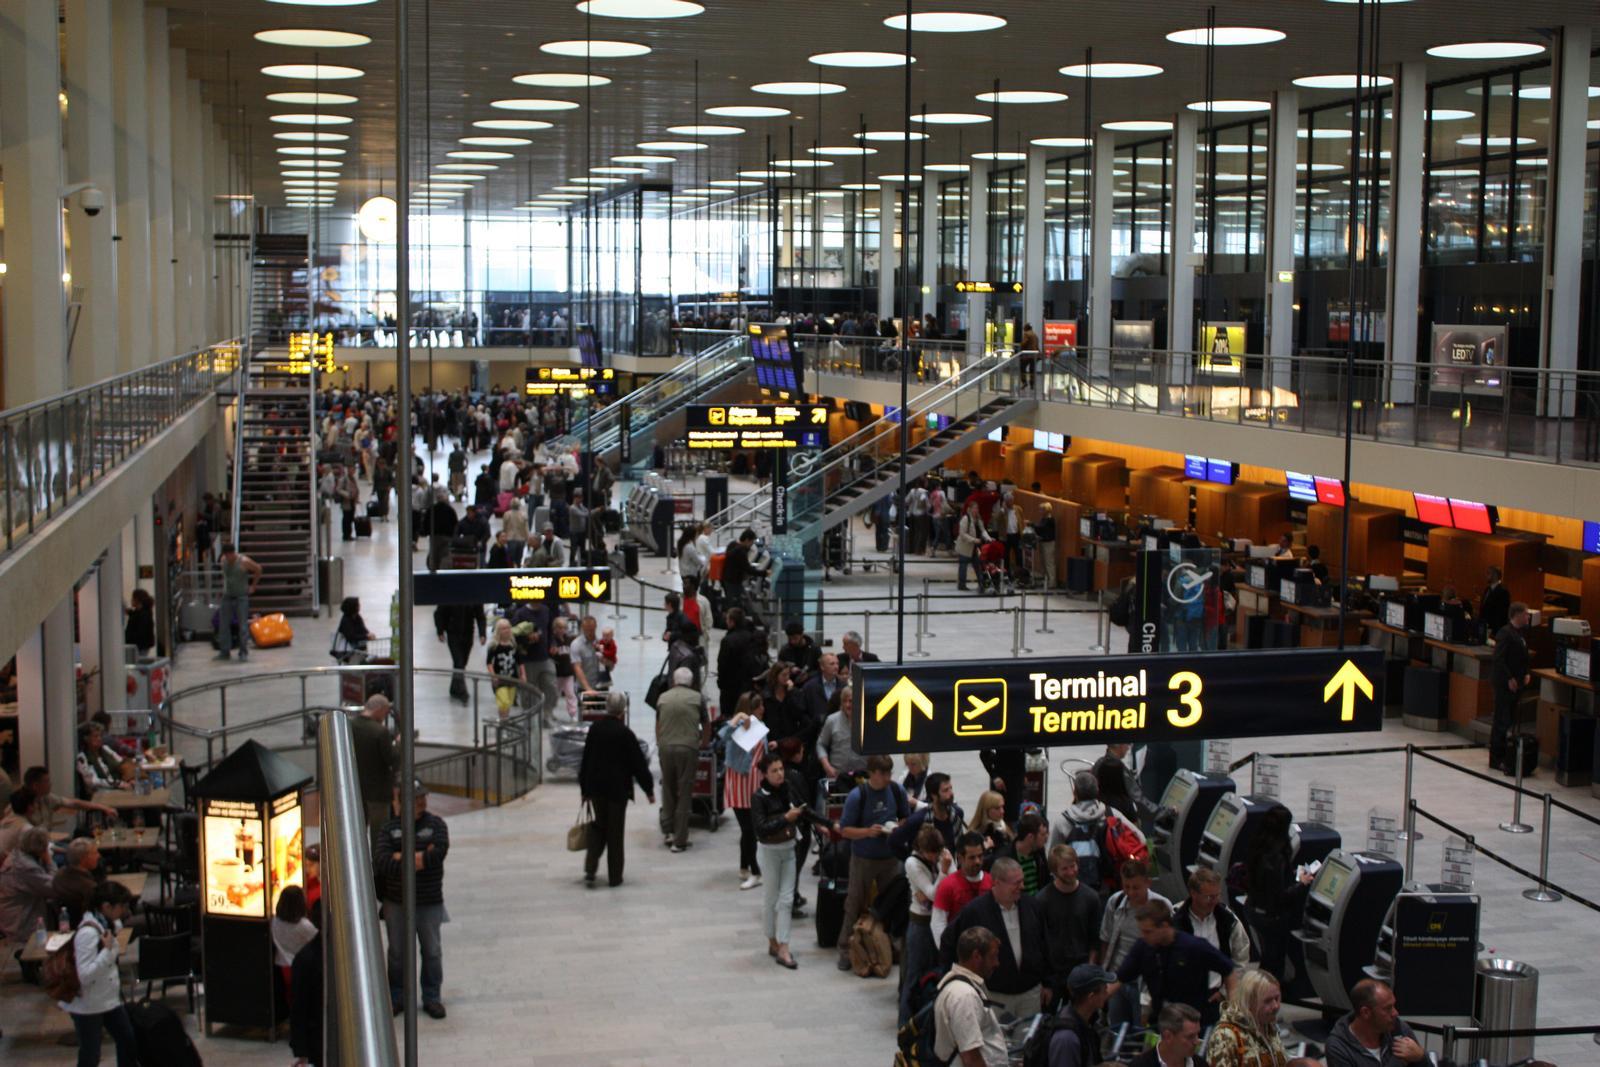 matas cph lufthavn